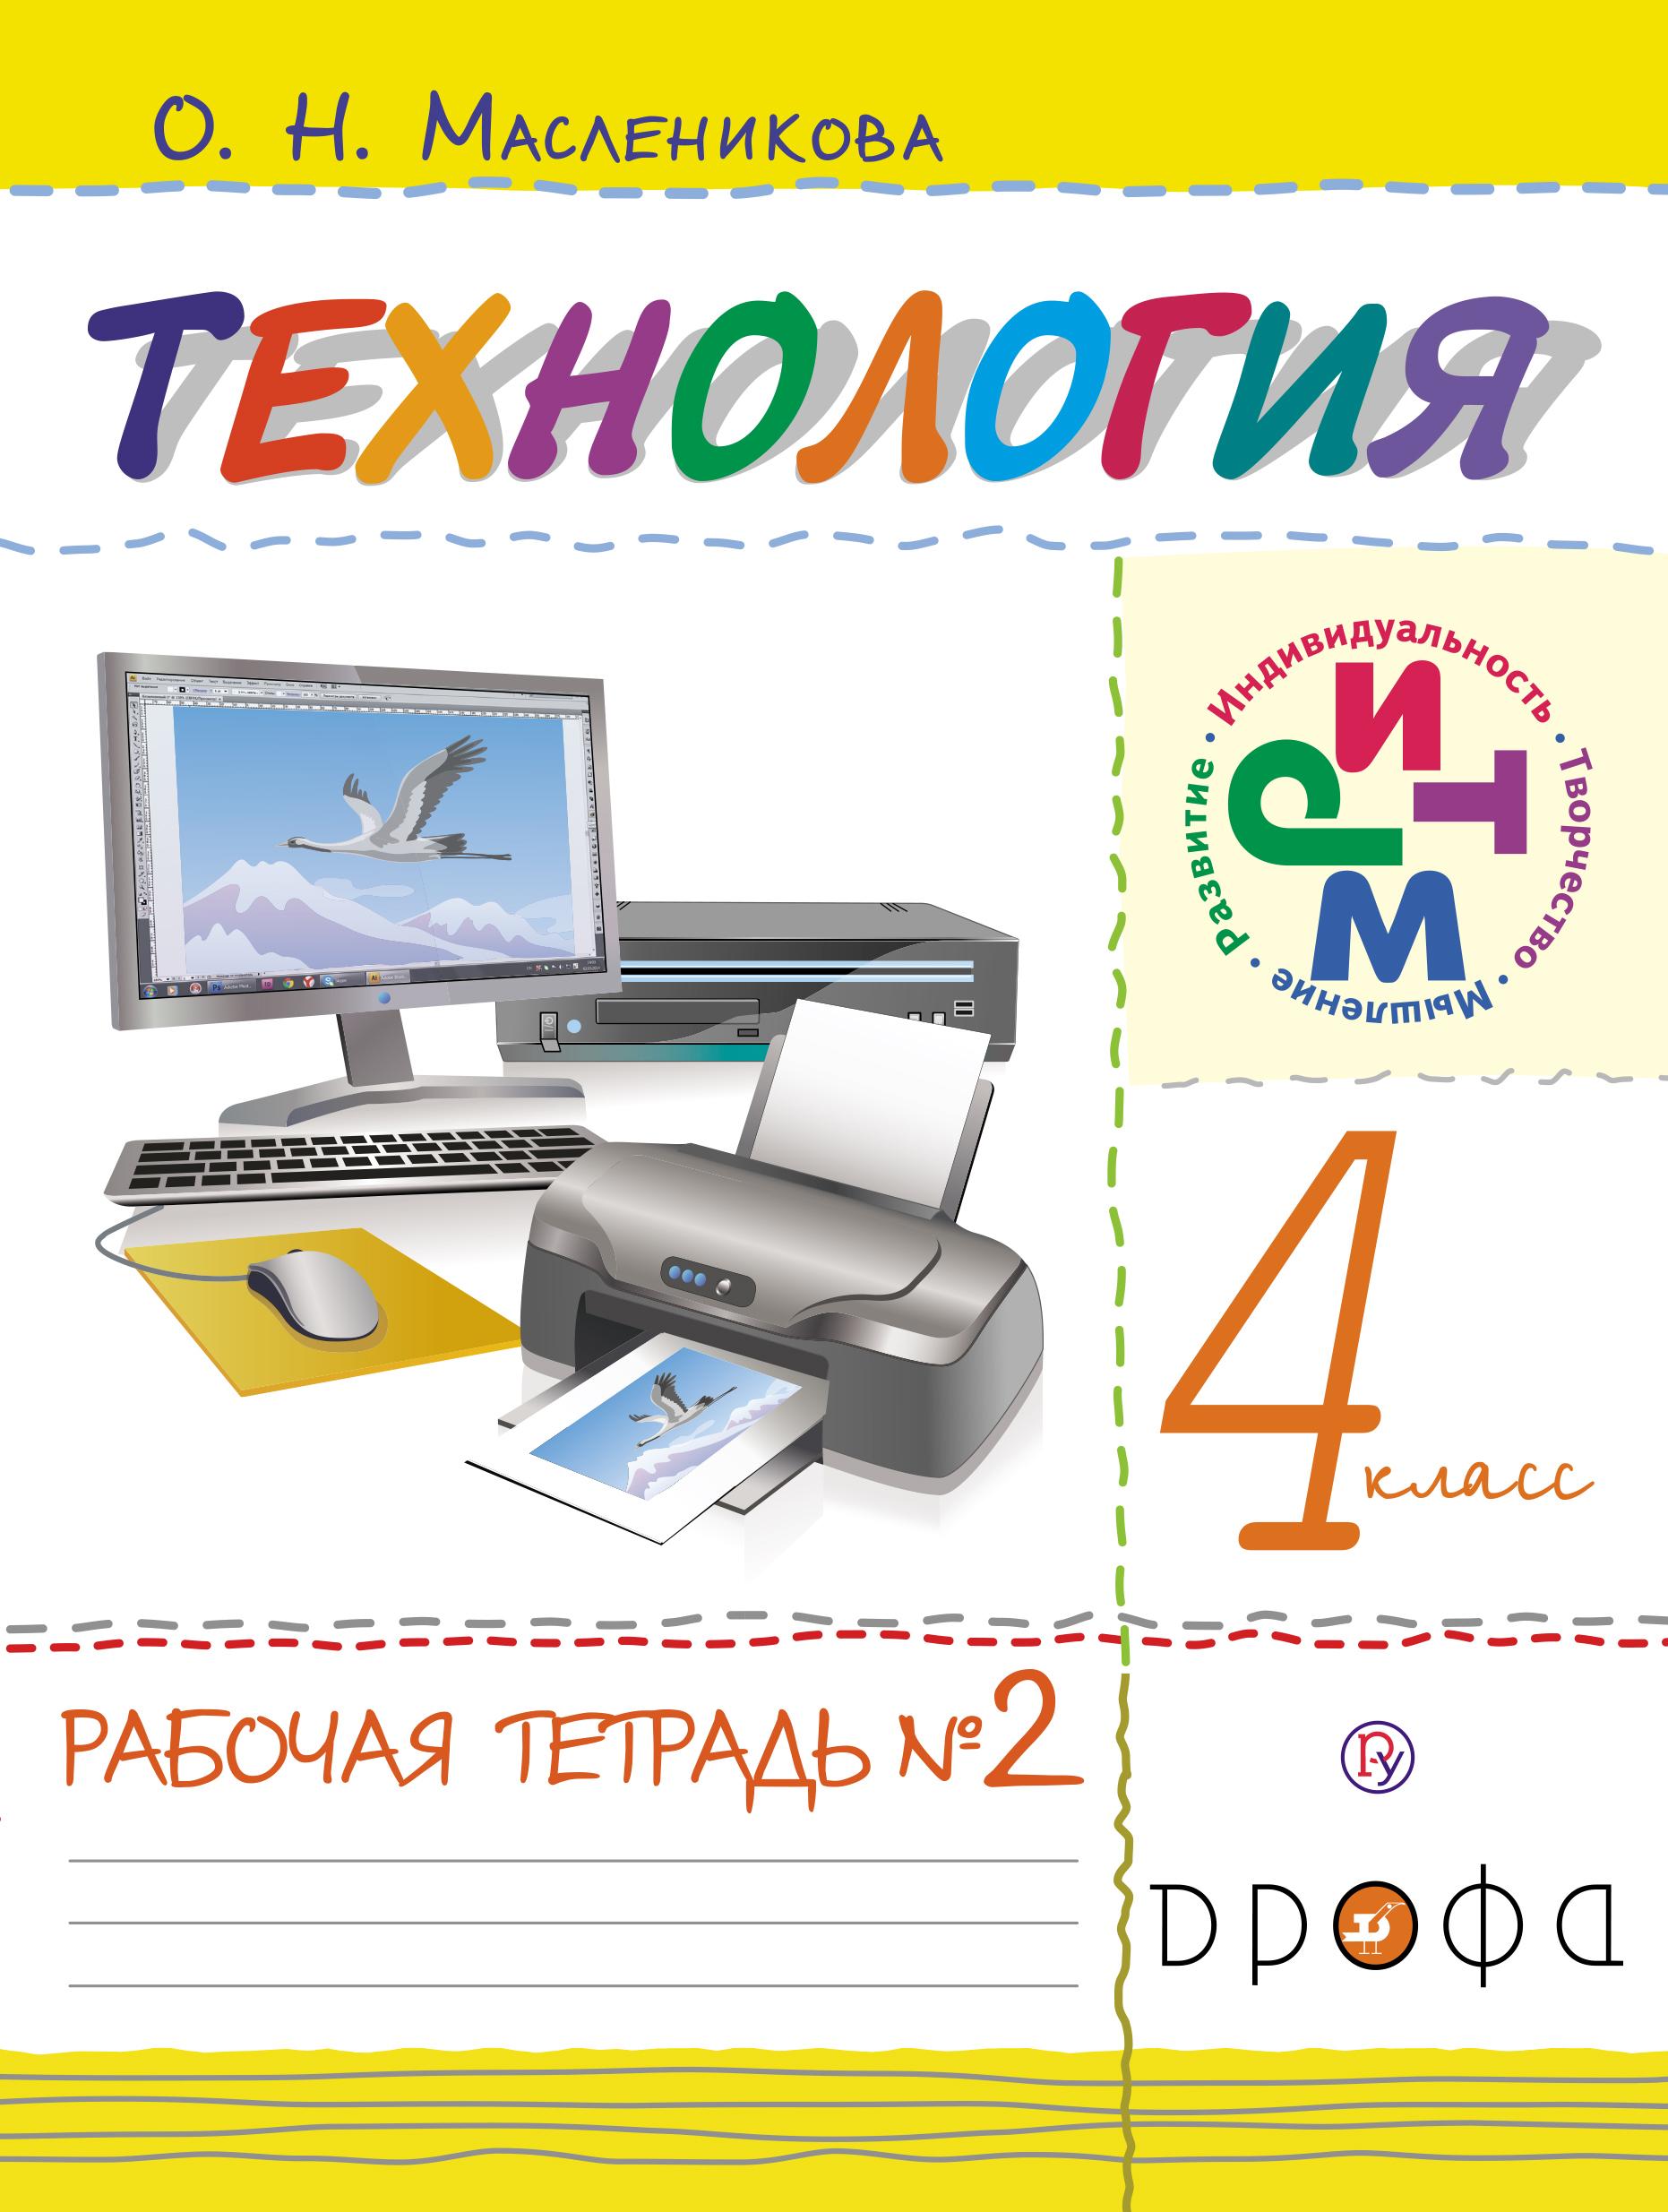 Малышева Н.А. Технология. 4 класс. Рабочая тетрадь № 2